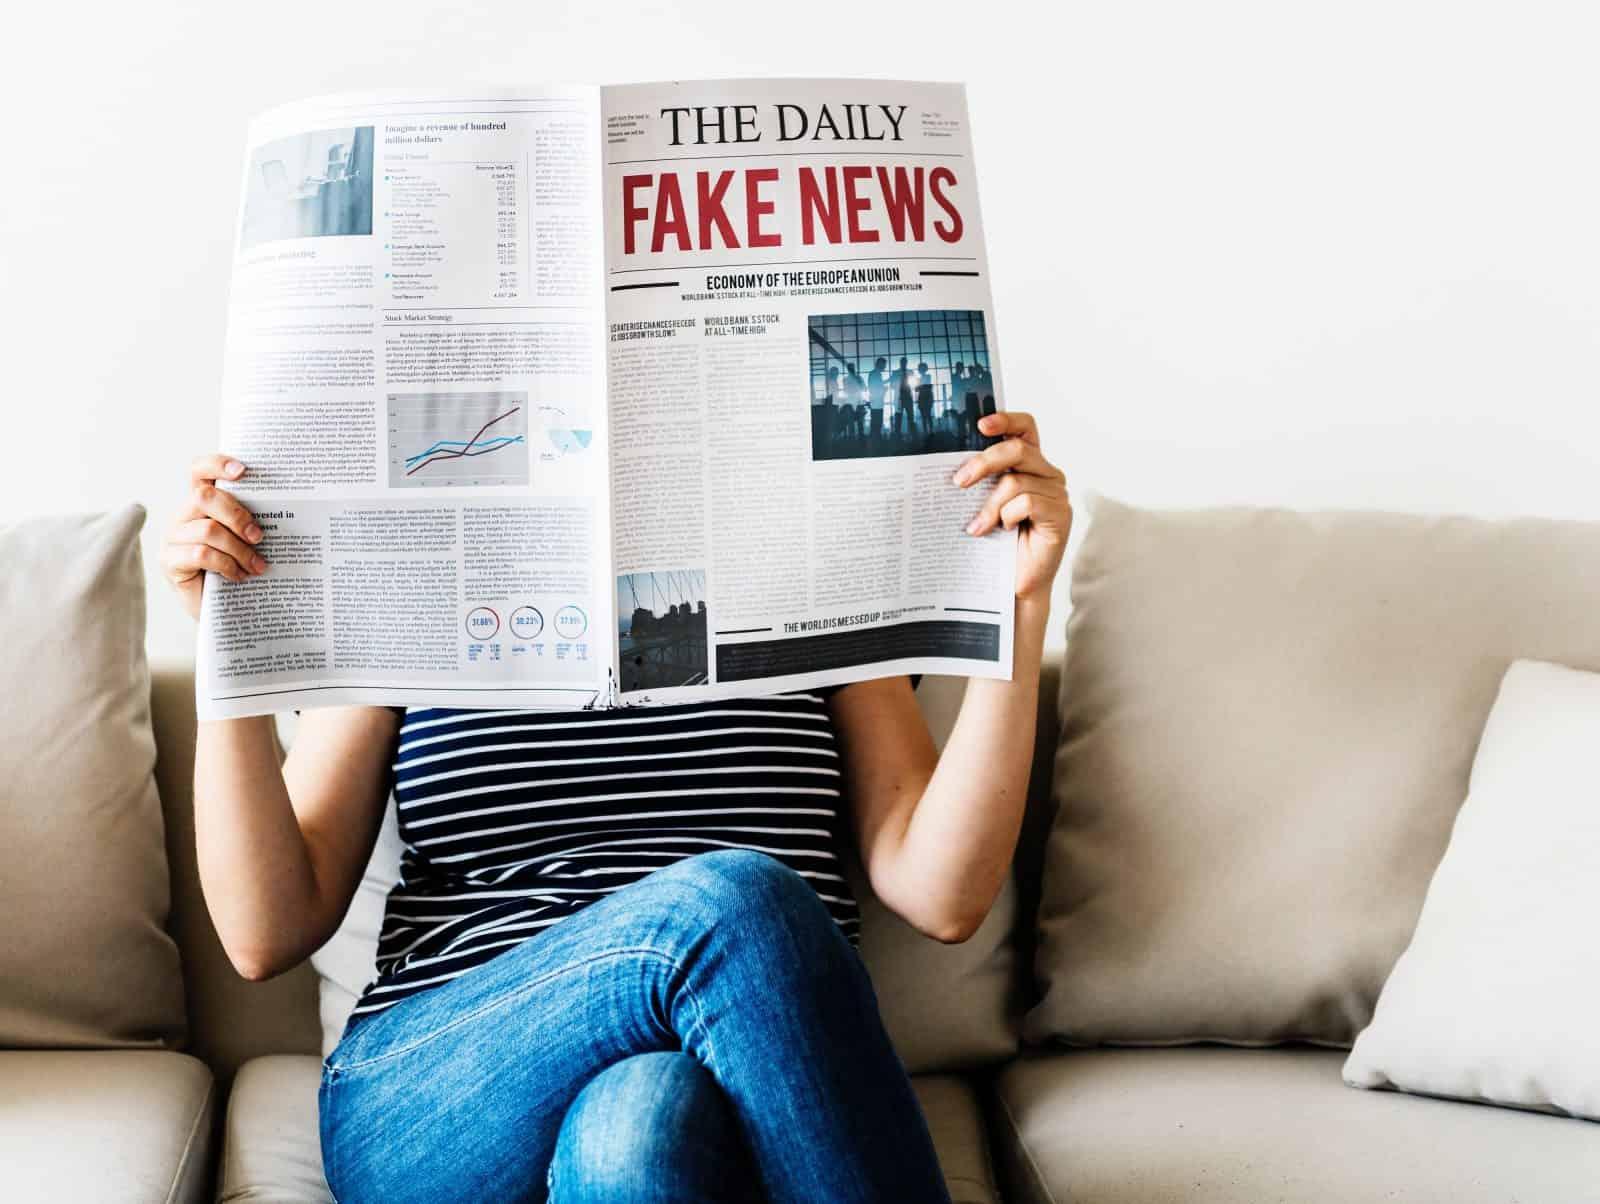 newspaper fake news